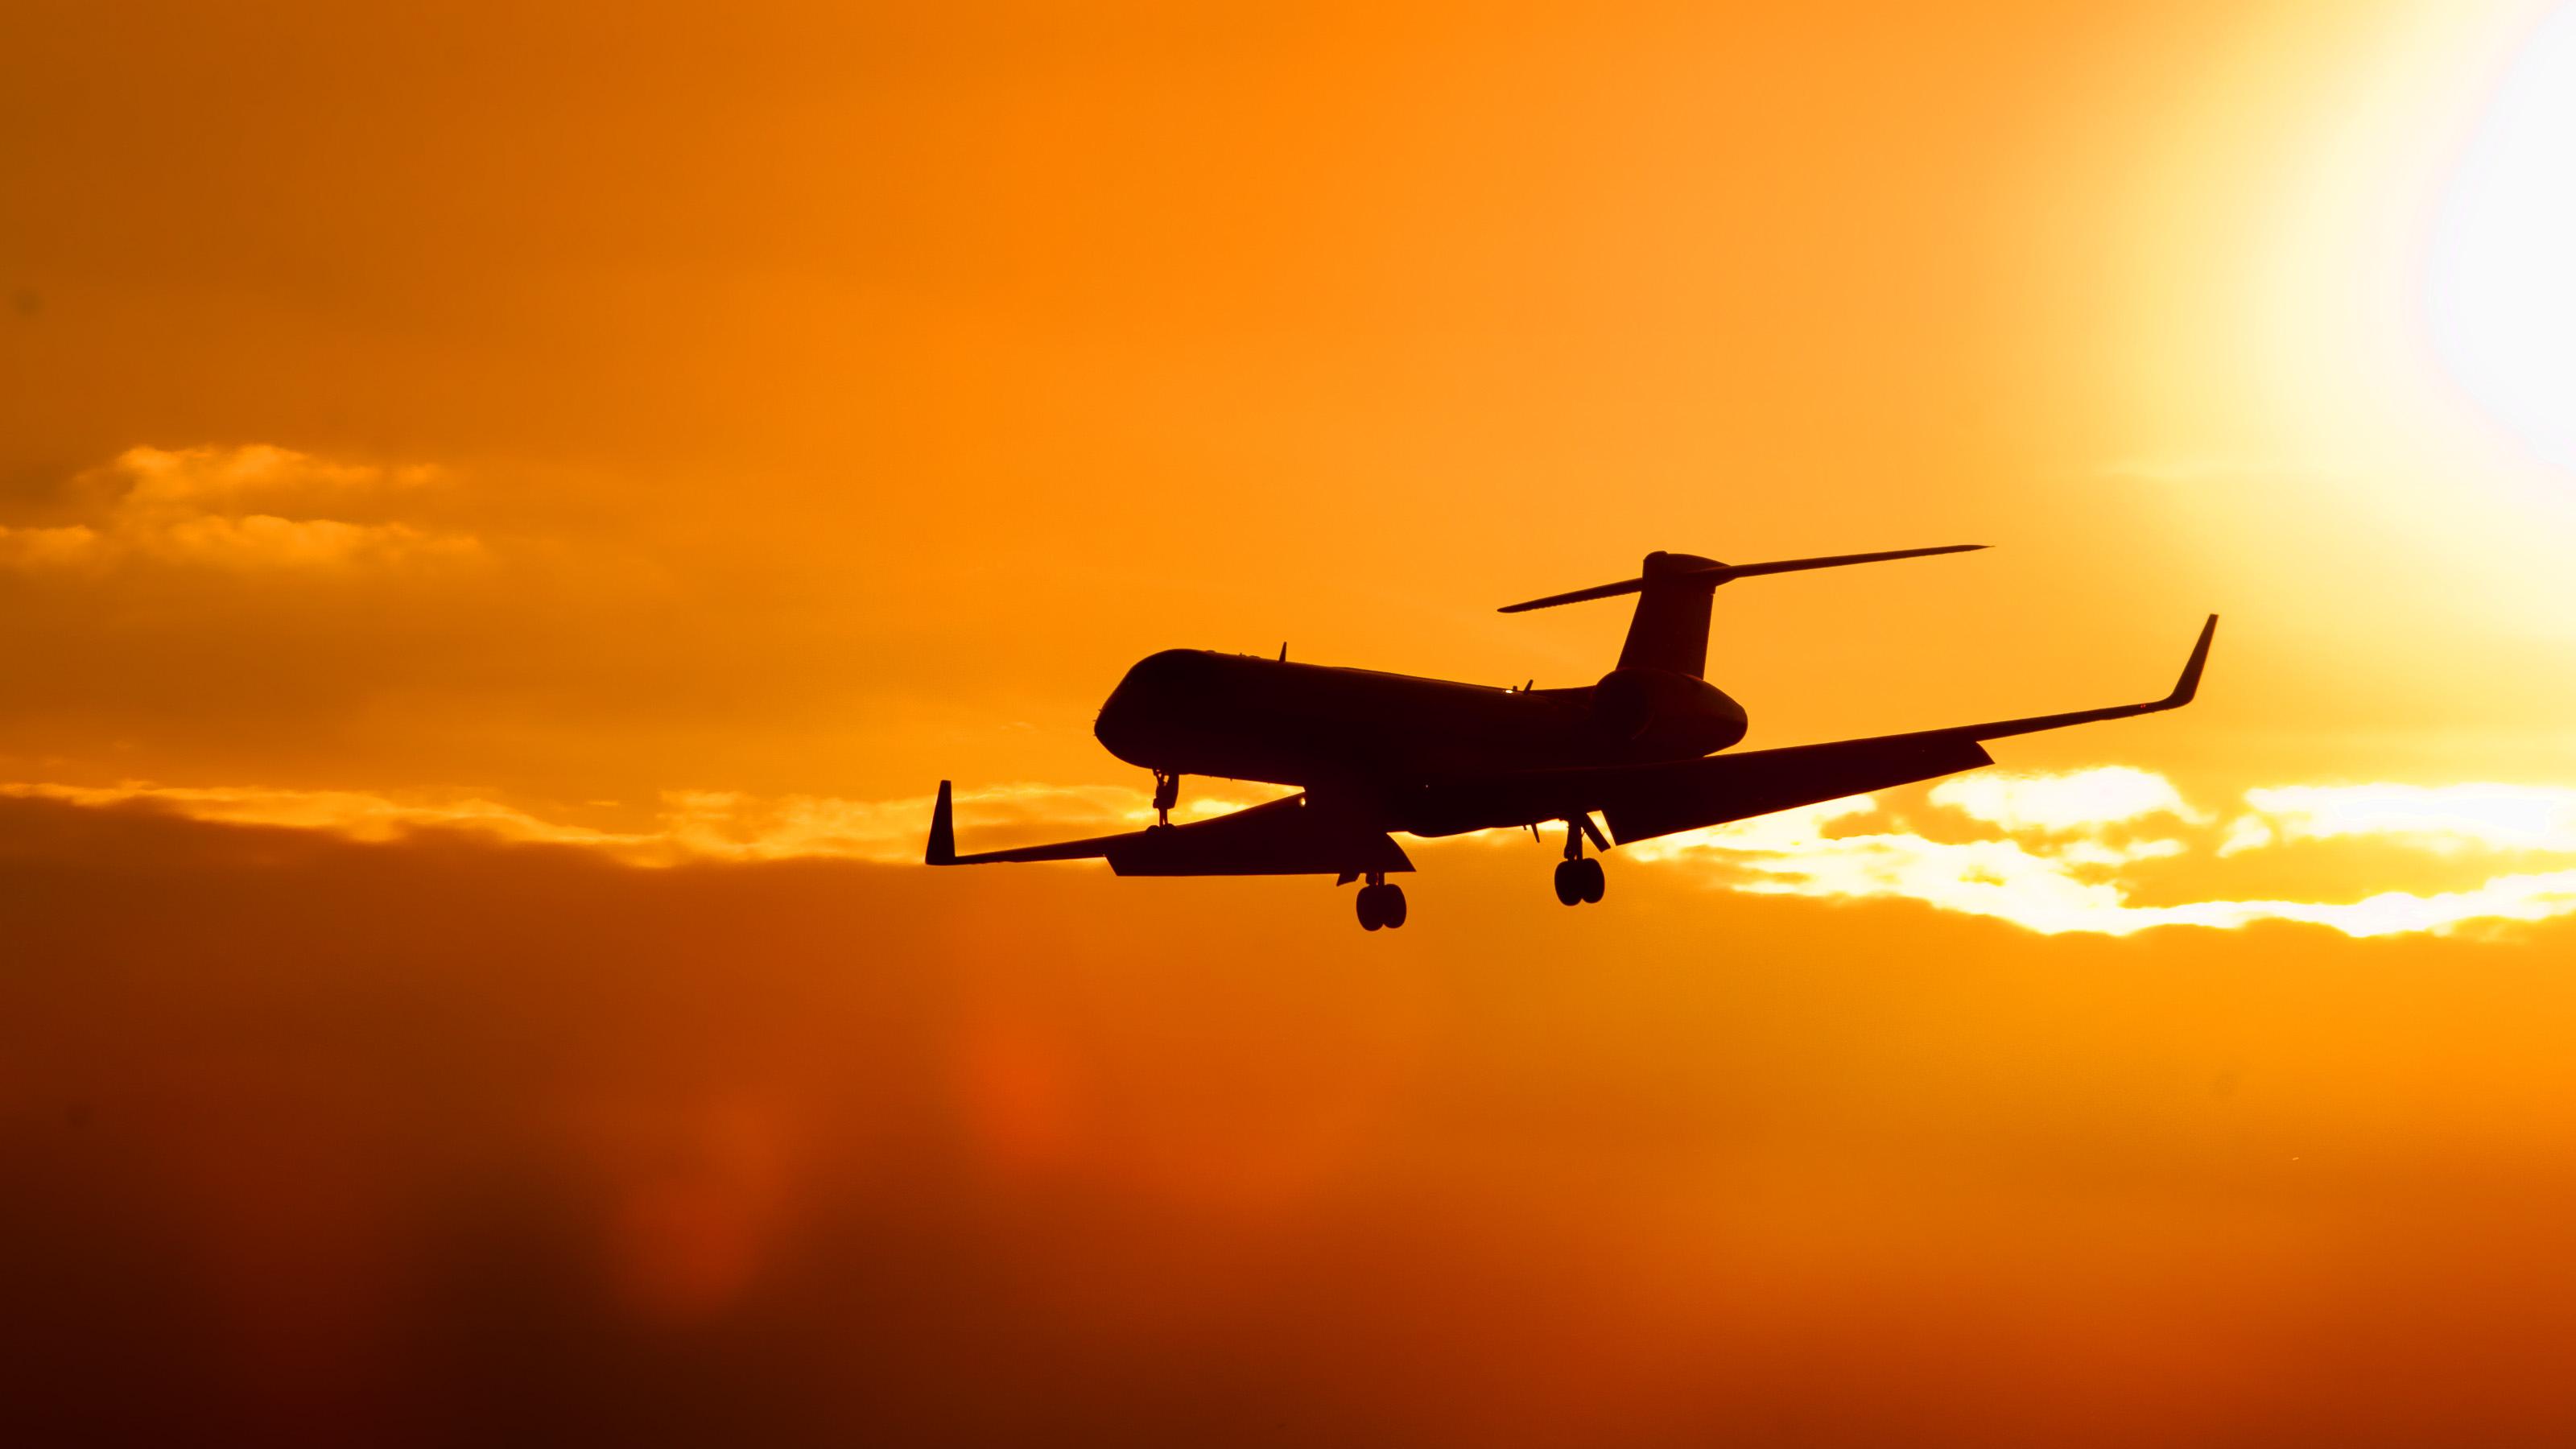 飞机 -  Flickr:野蛮人 - 在GO上进行绿色的5个提示